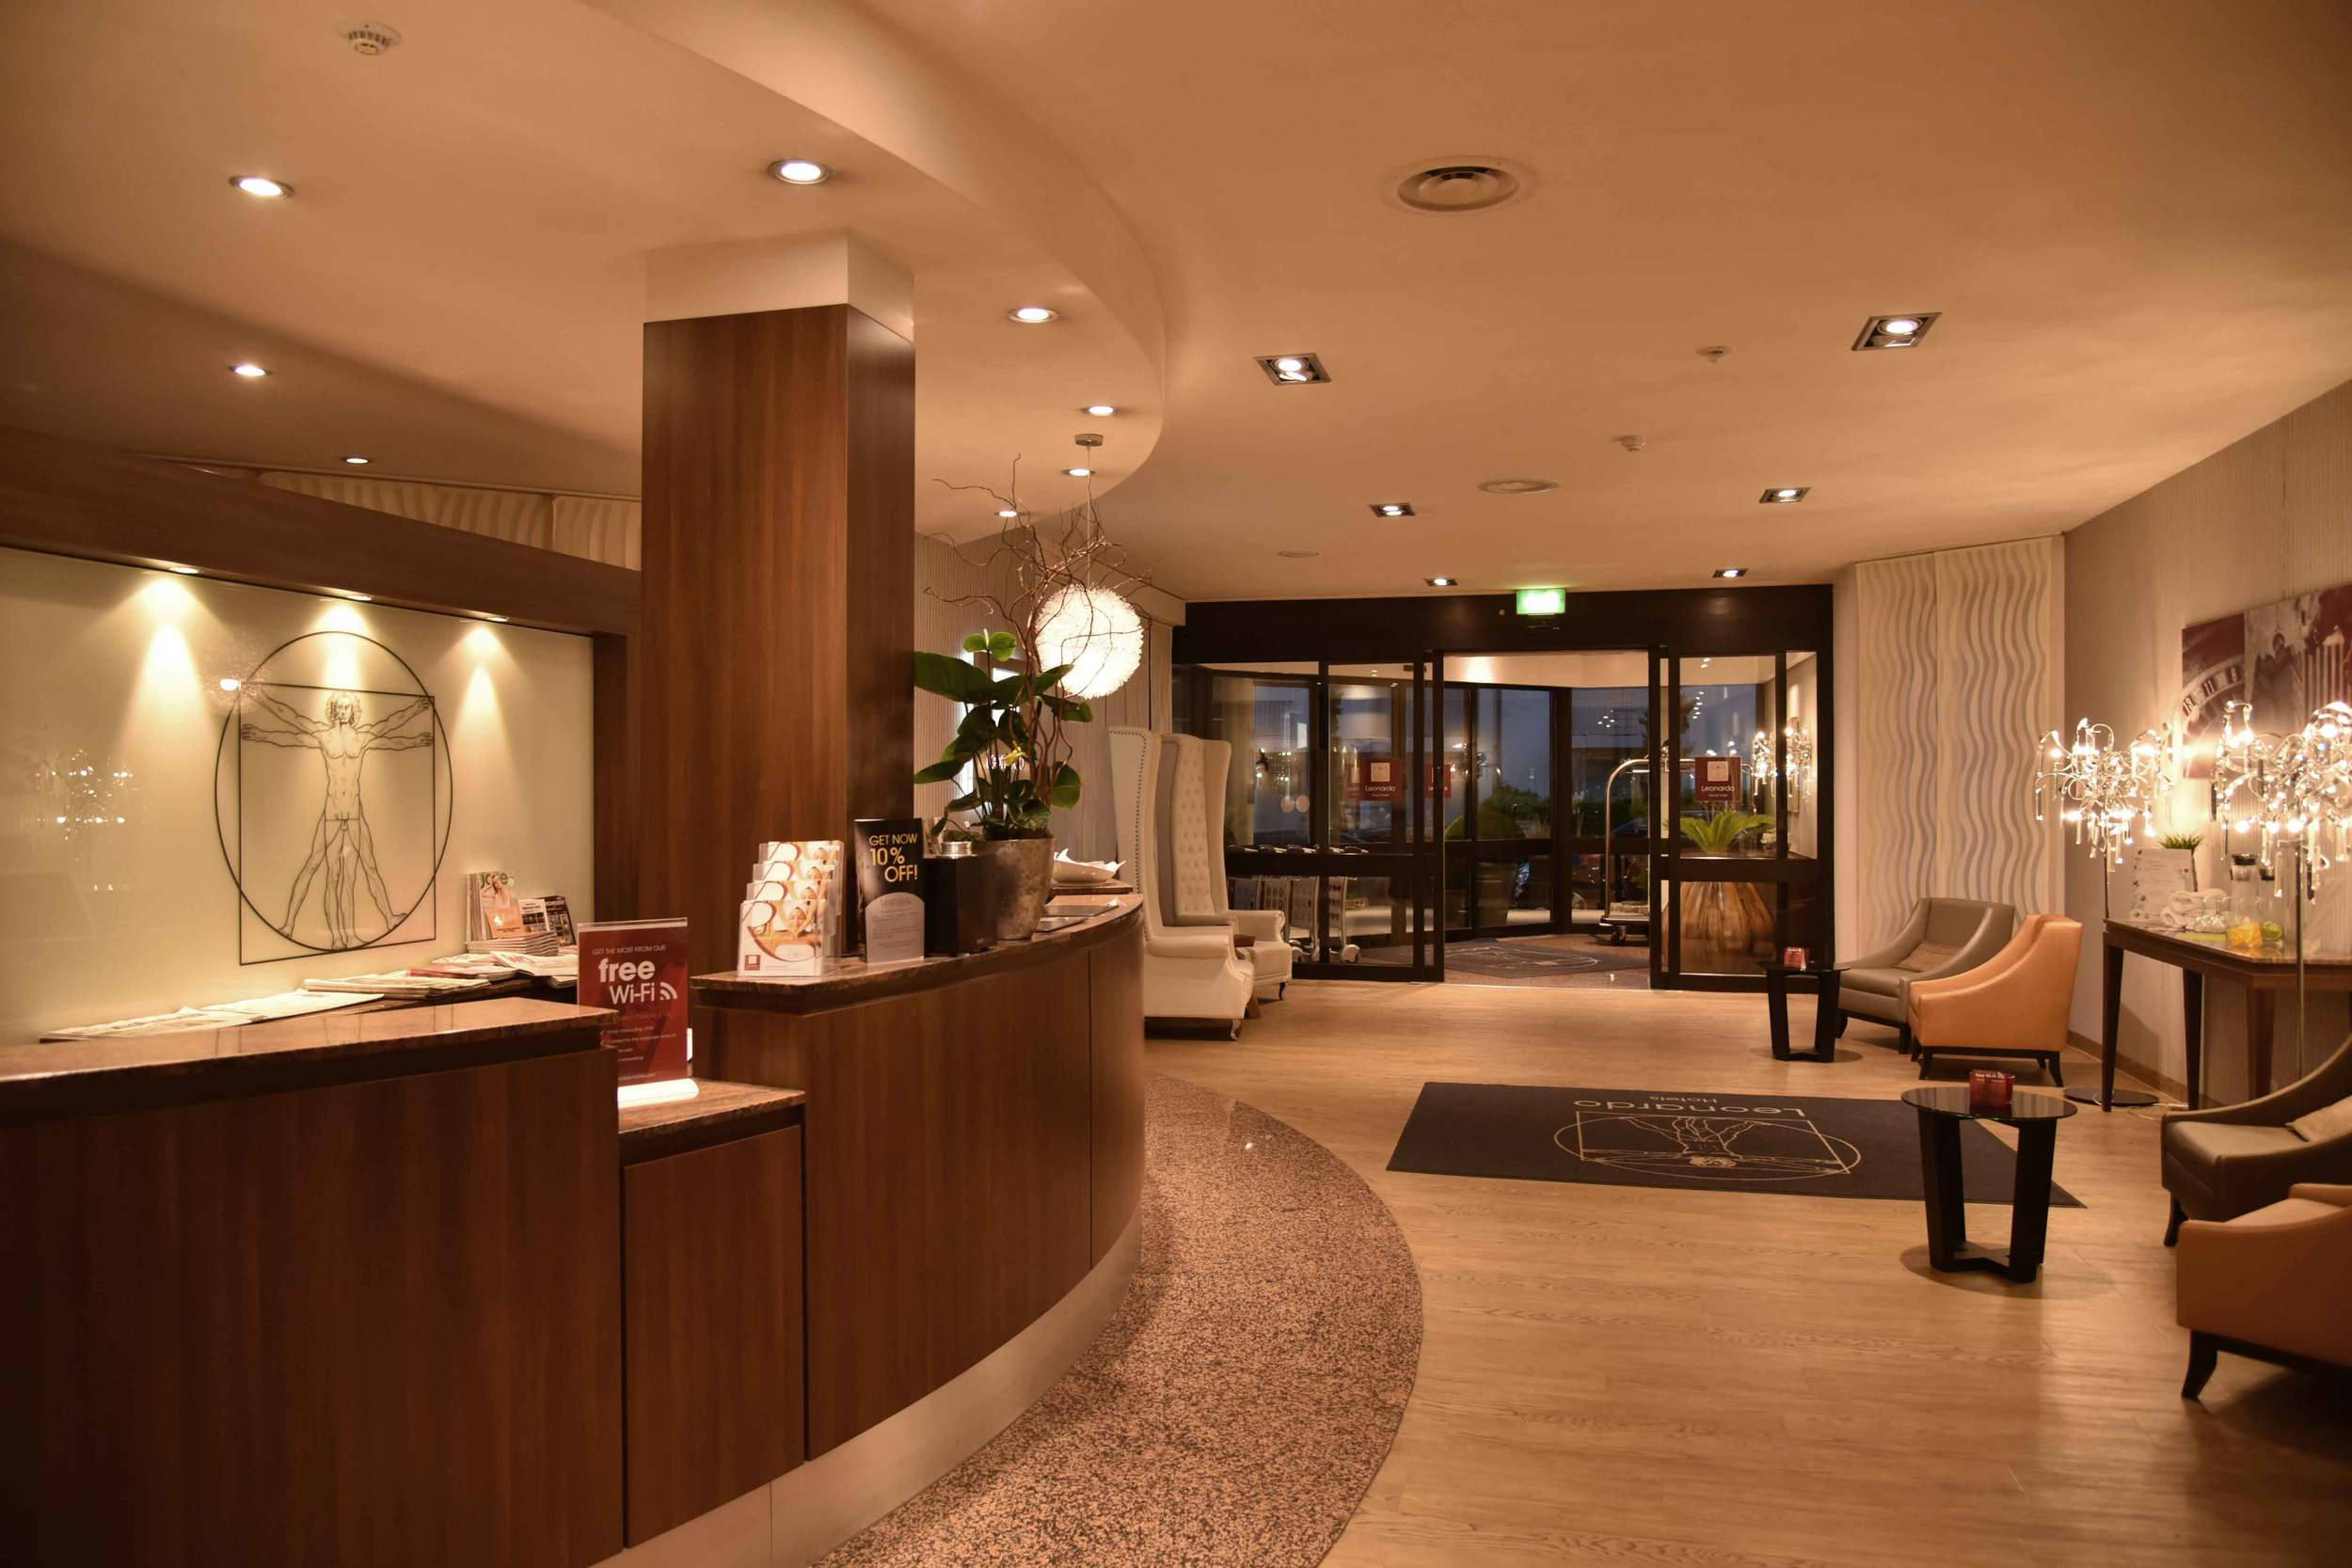 Front desk, reception area, lobby, Leonardo Royal hotel, Baden Baden, Germany. Image©sourcingstyle.com